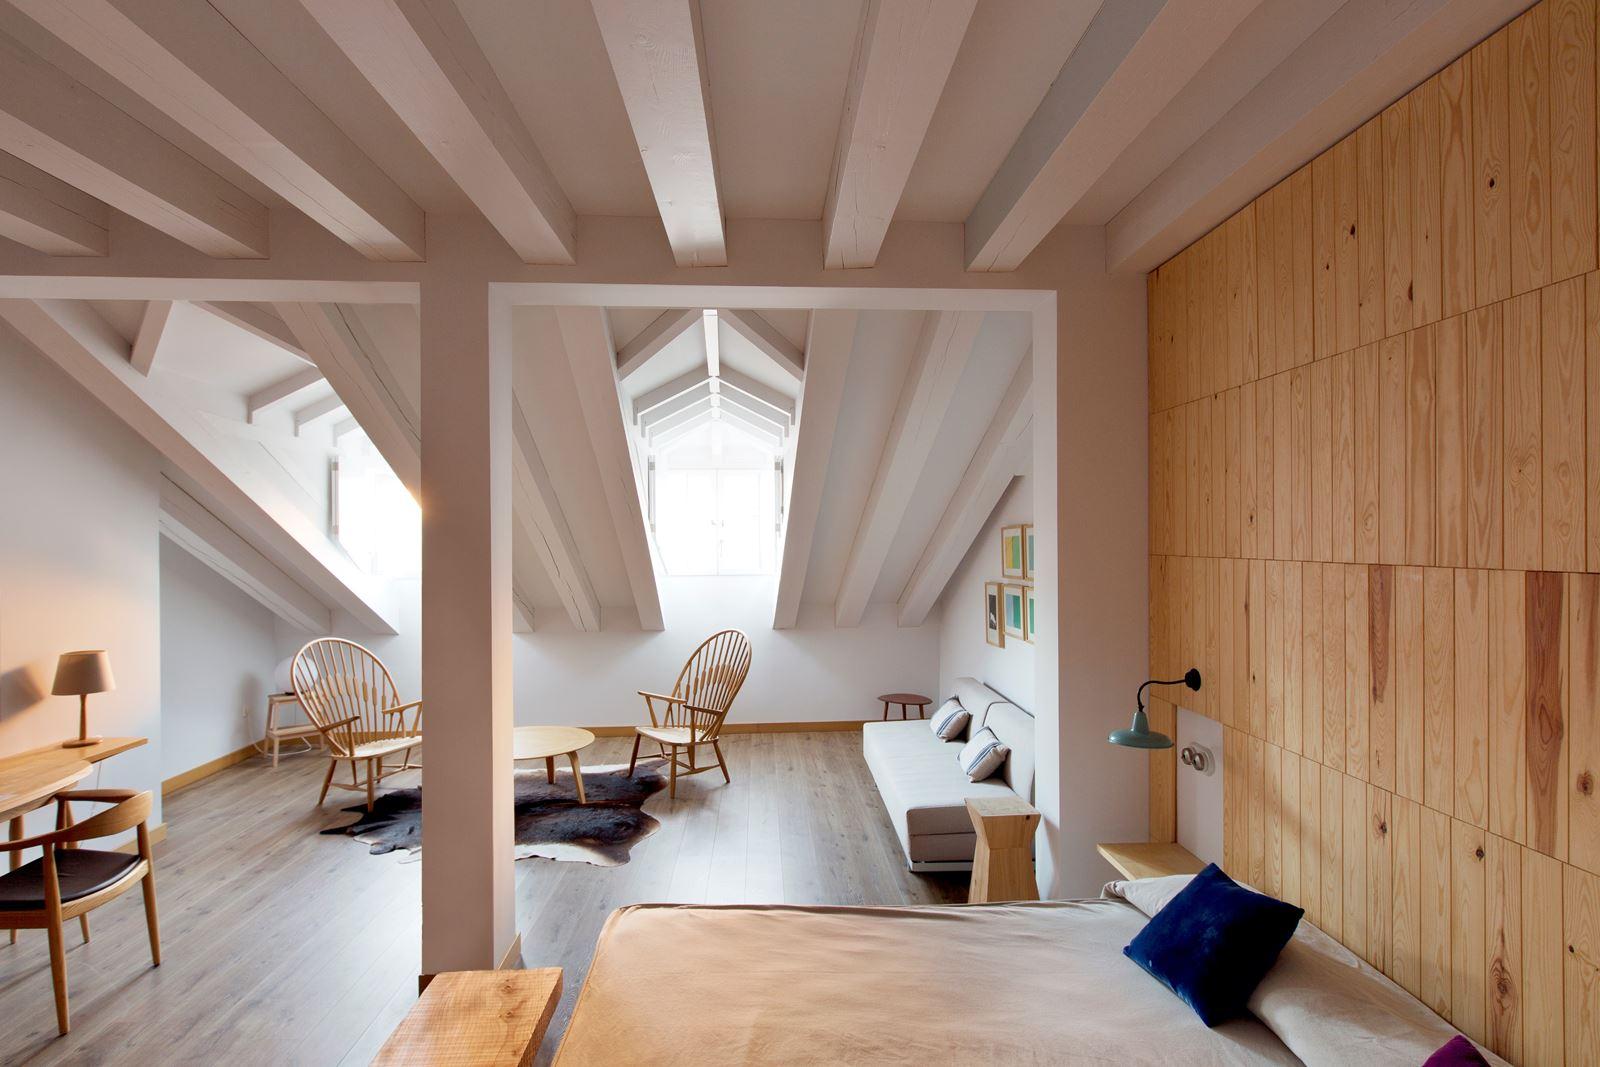 abbastanza Un hotel con stanze in mansarda in un borgo medievale - Mansarda.it DN26